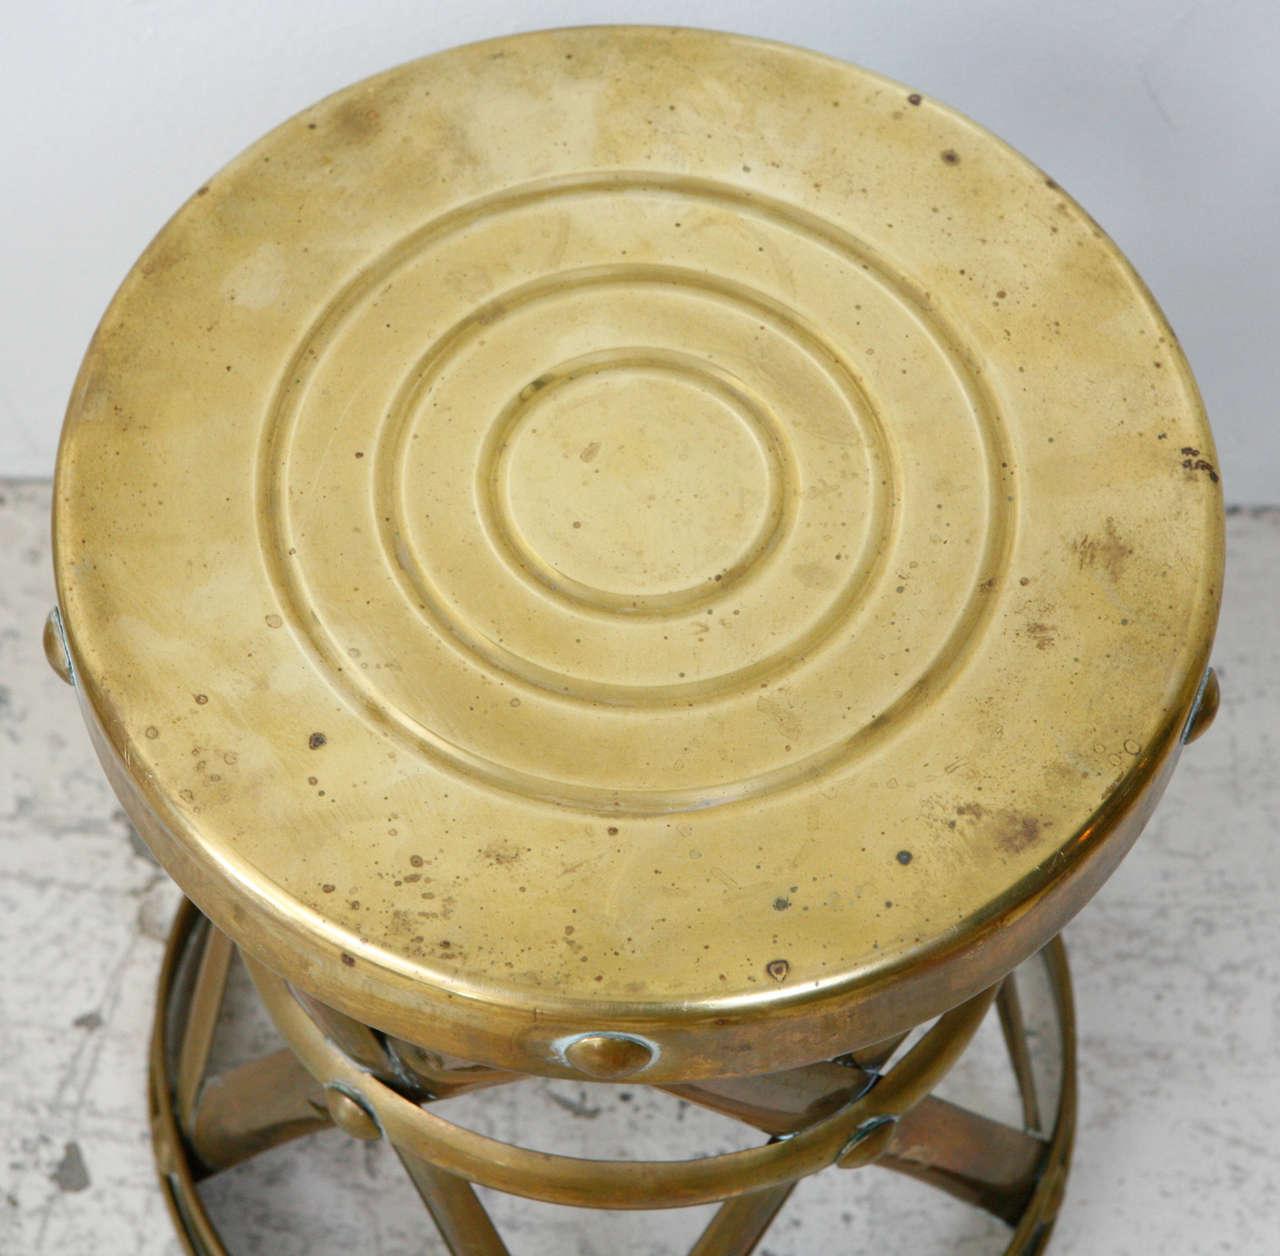 Vintage Brass Drum Stool At 1stdibs